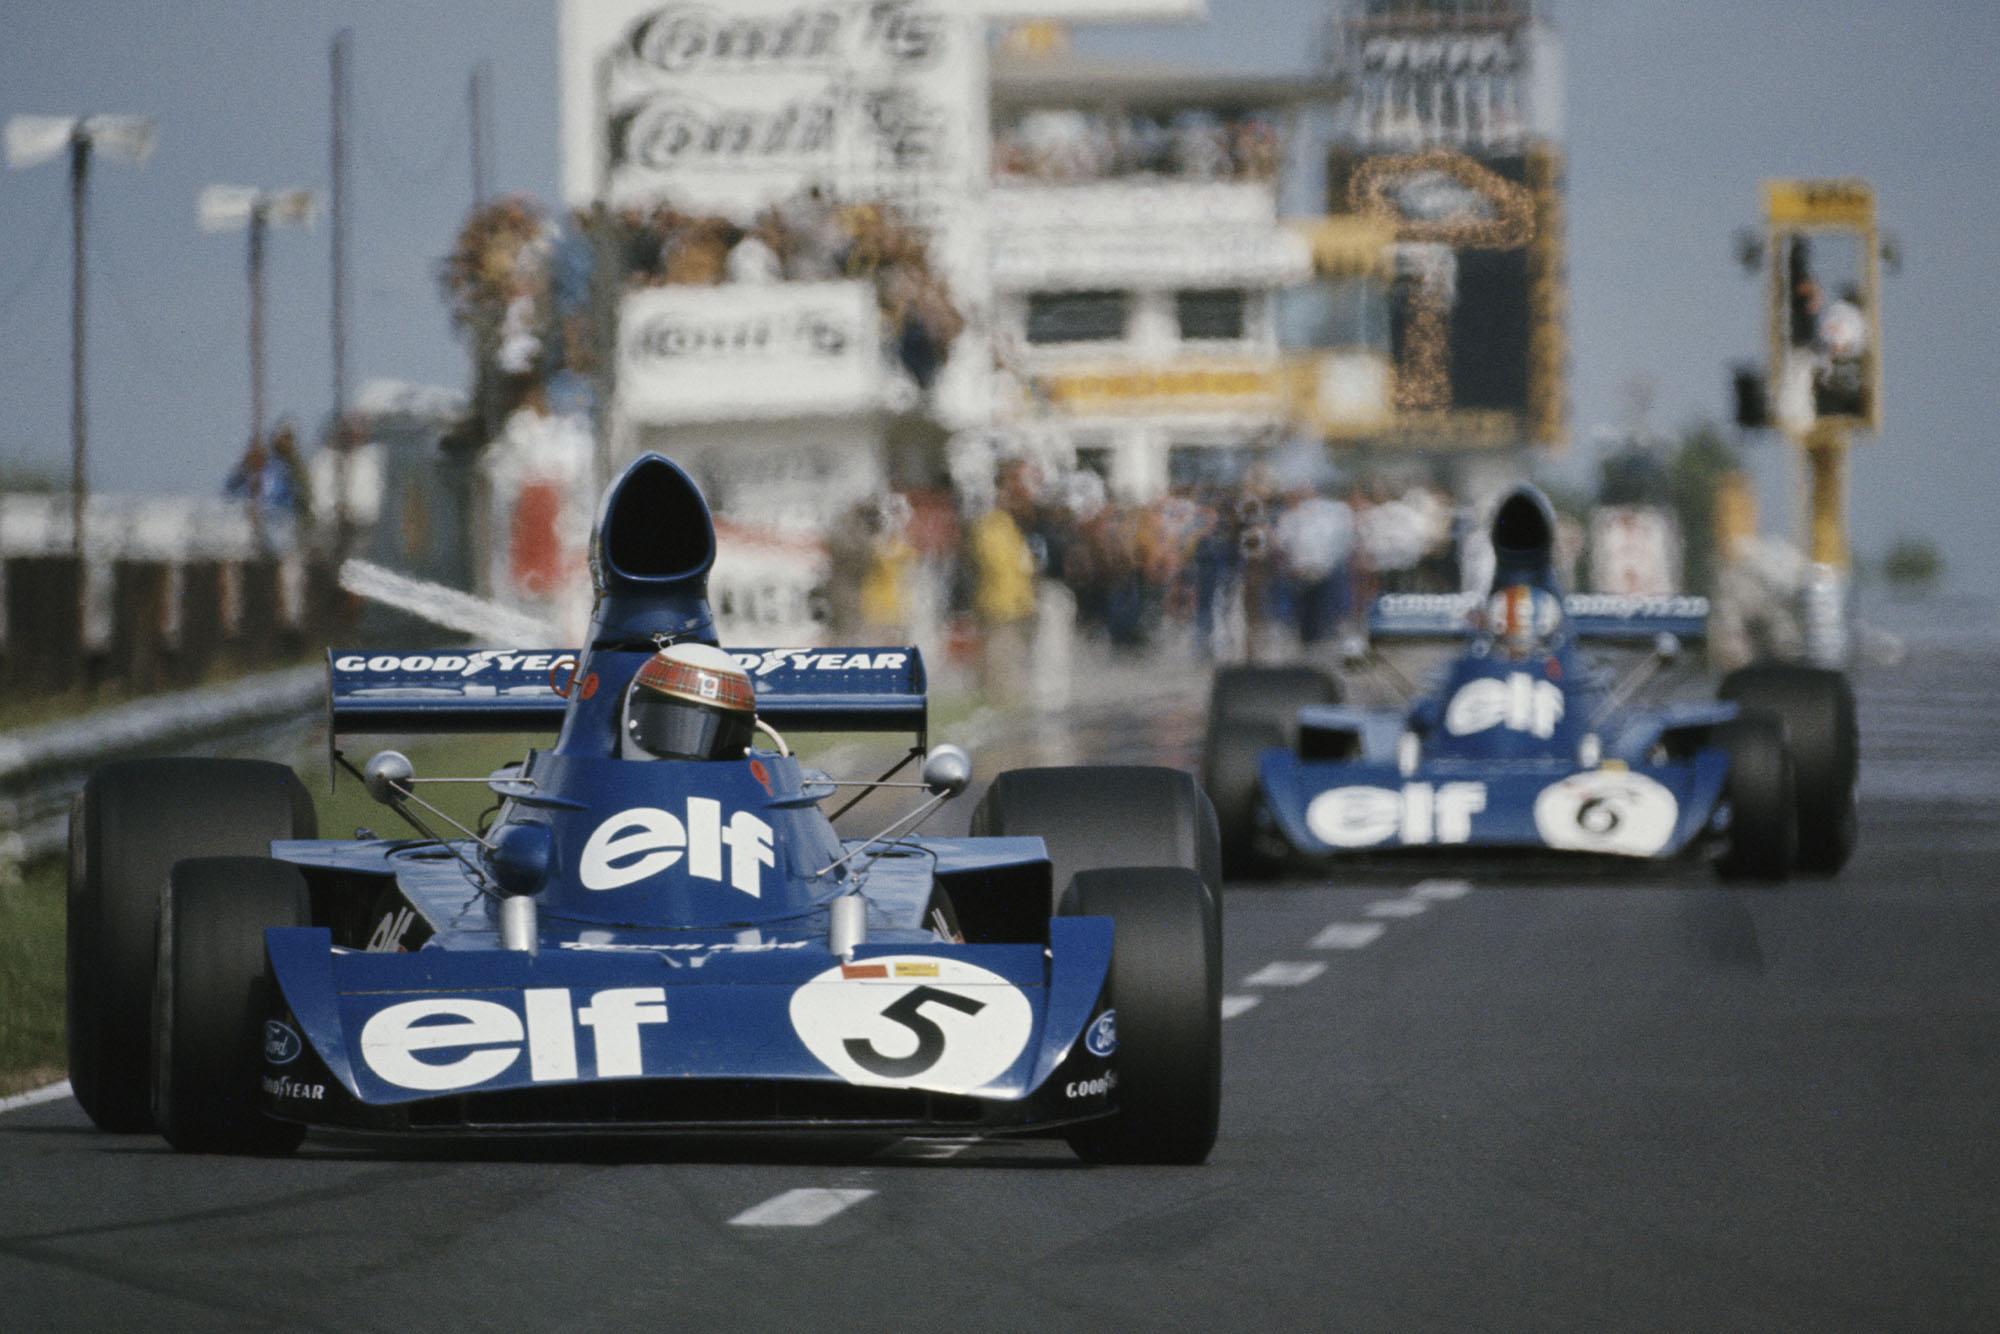 Jackie Stewart leads Tyrrell team-mate Francois Cevert at the 1973 German Grand Prix, Nurburgring.